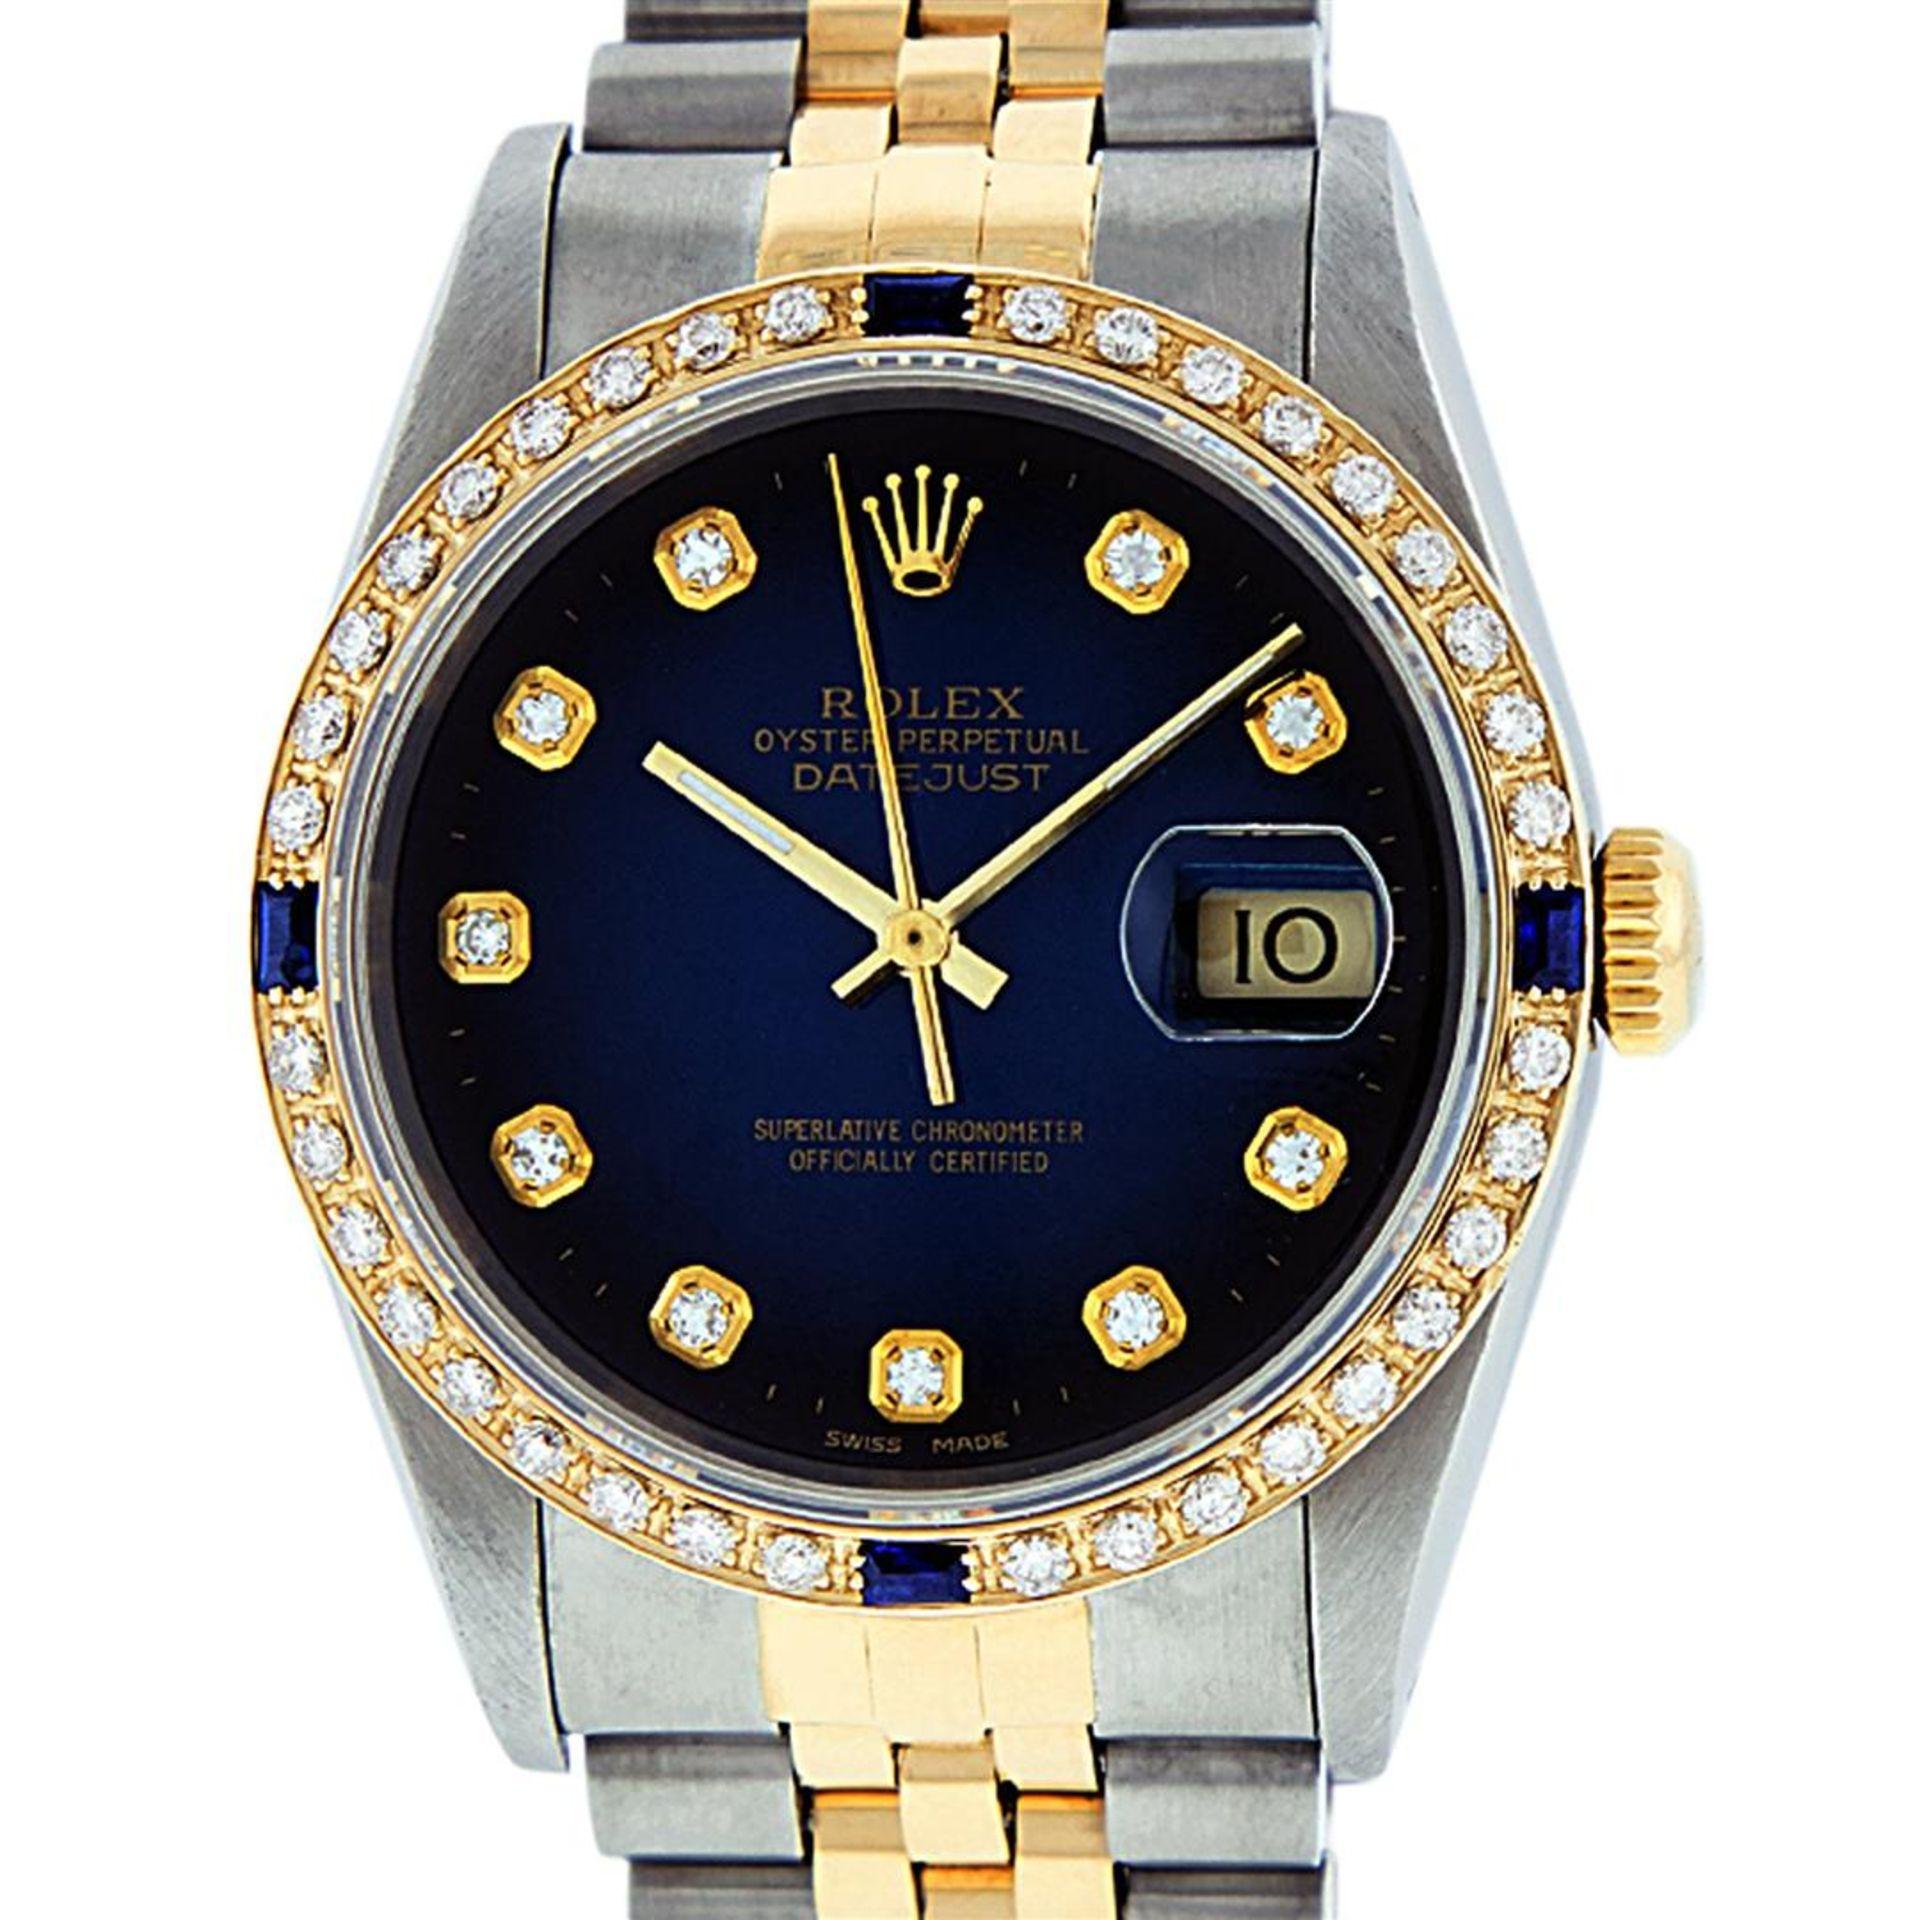 Rolex Mens 2 Tone Blue Vignette Diamond & Sapphire Datejust Wristwatch - Image 2 of 9